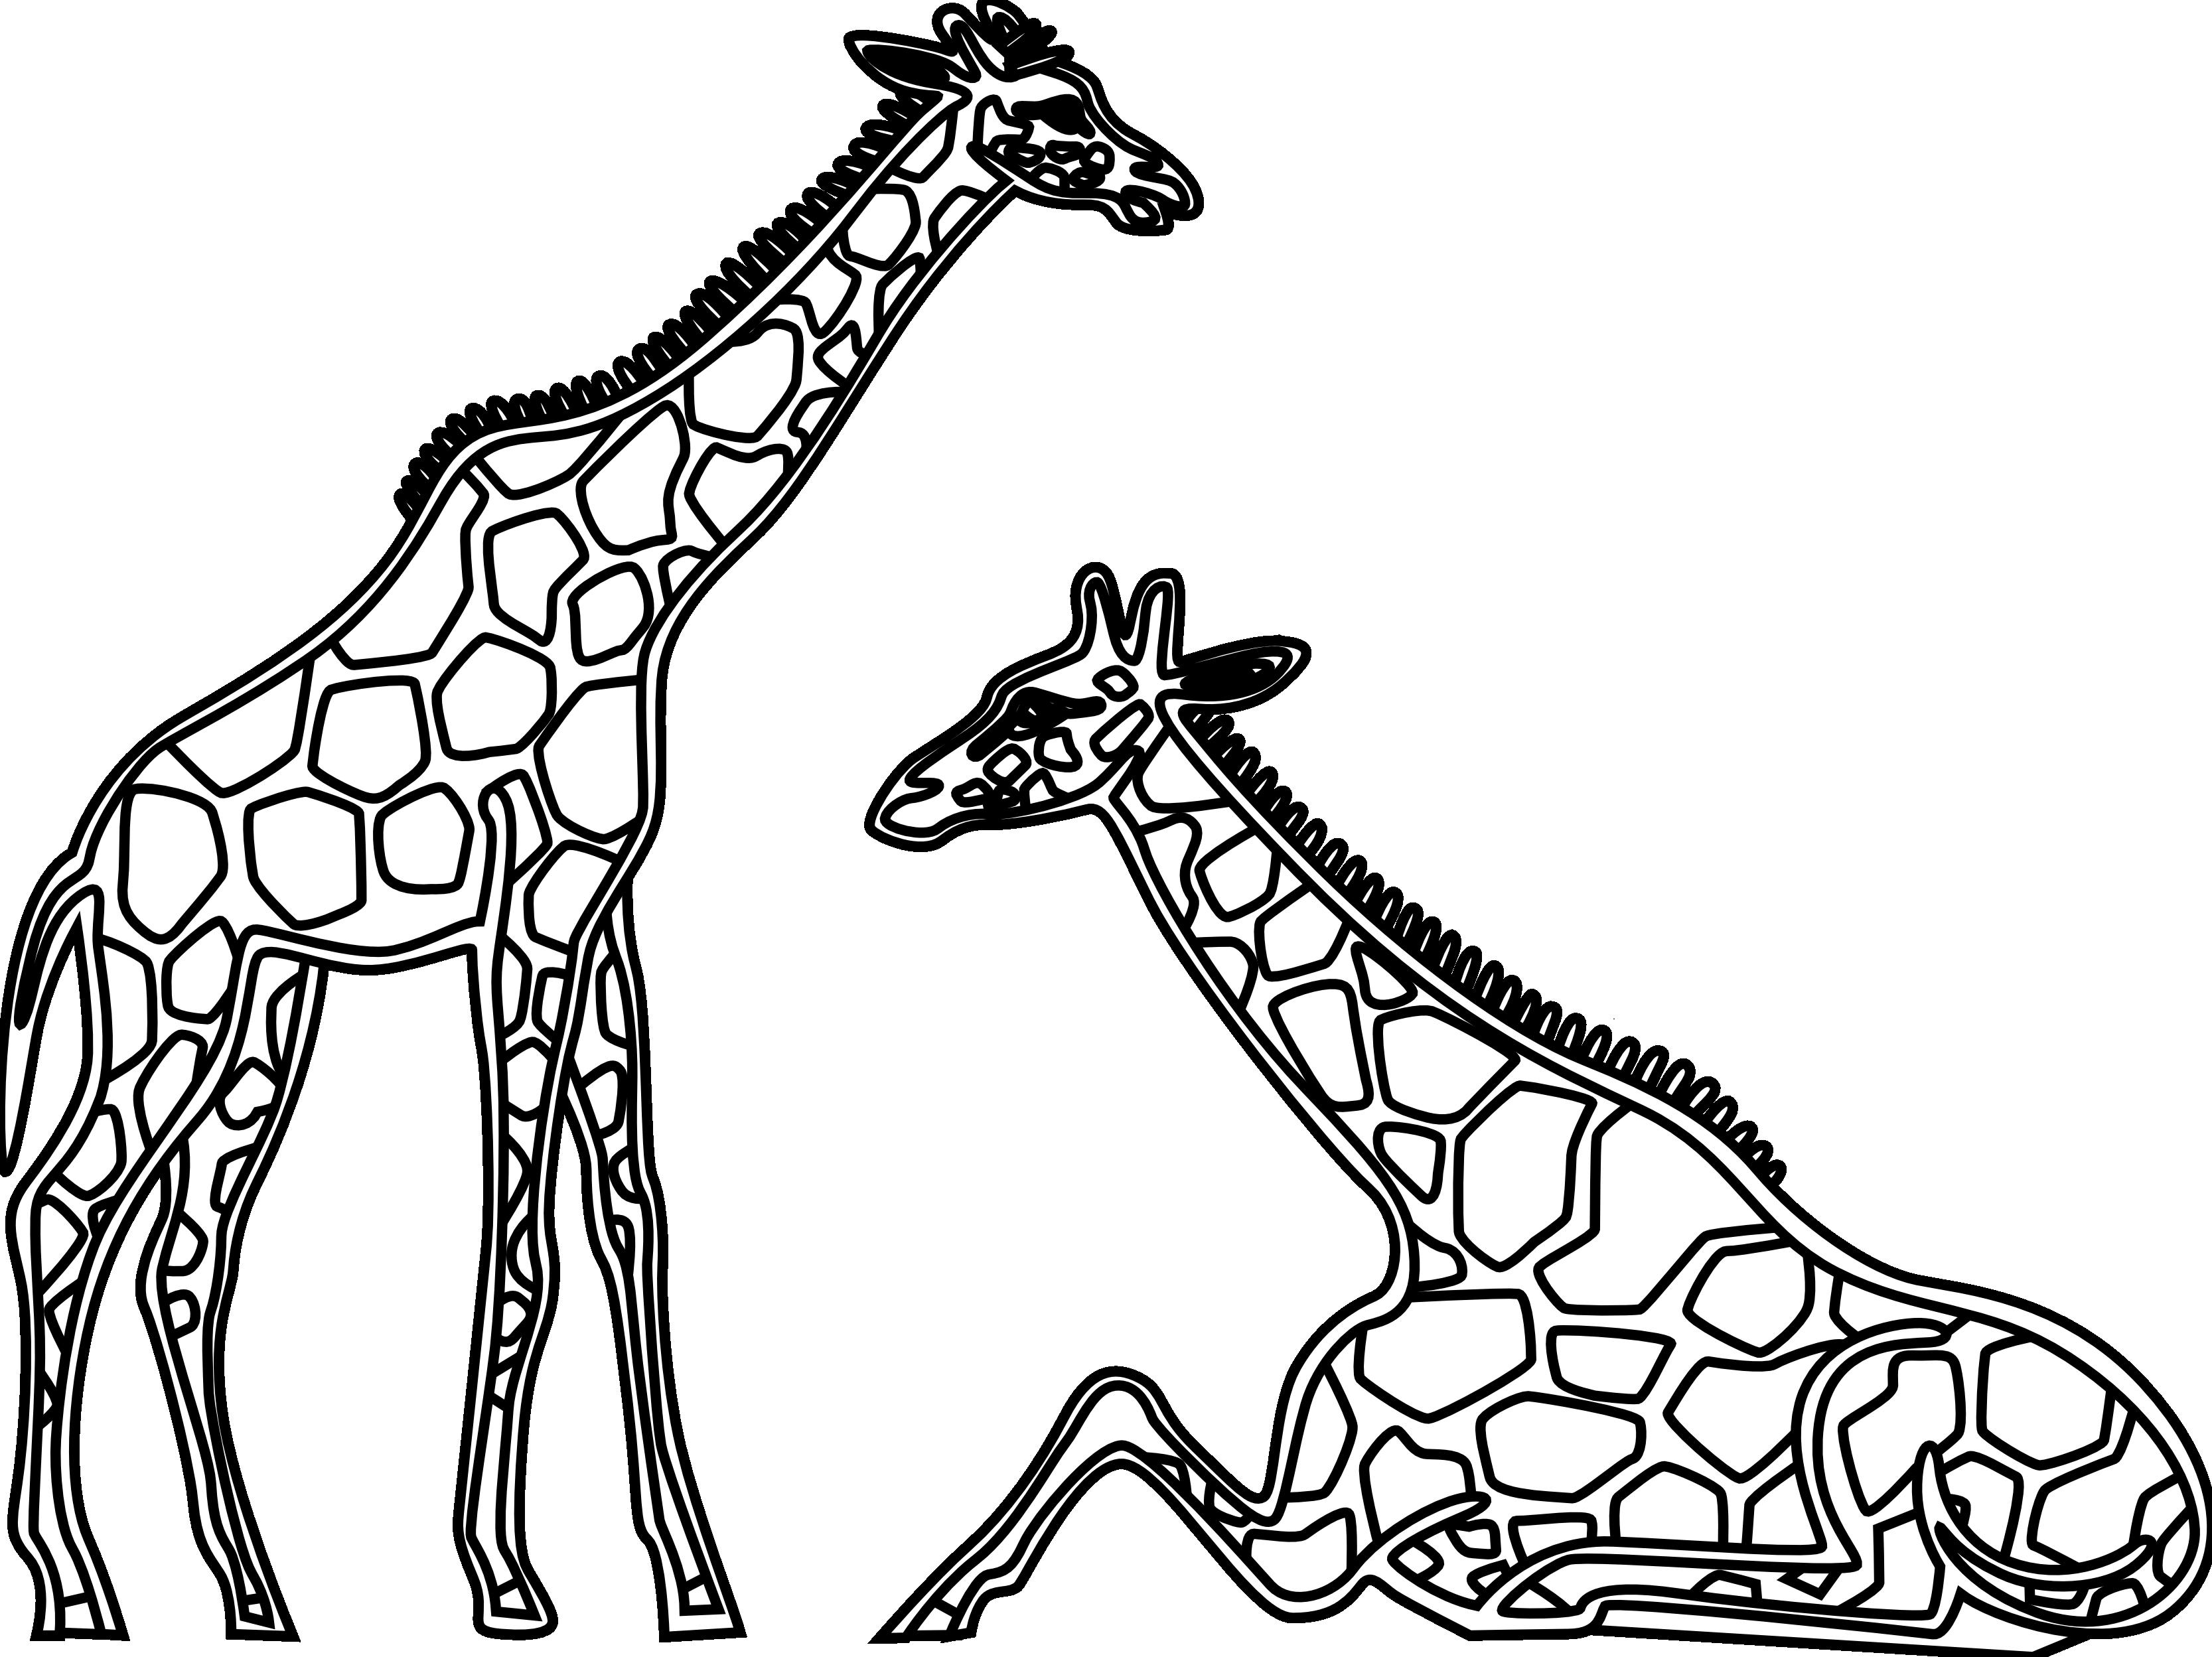 Clipart giraffe black and white. Clip art panda free